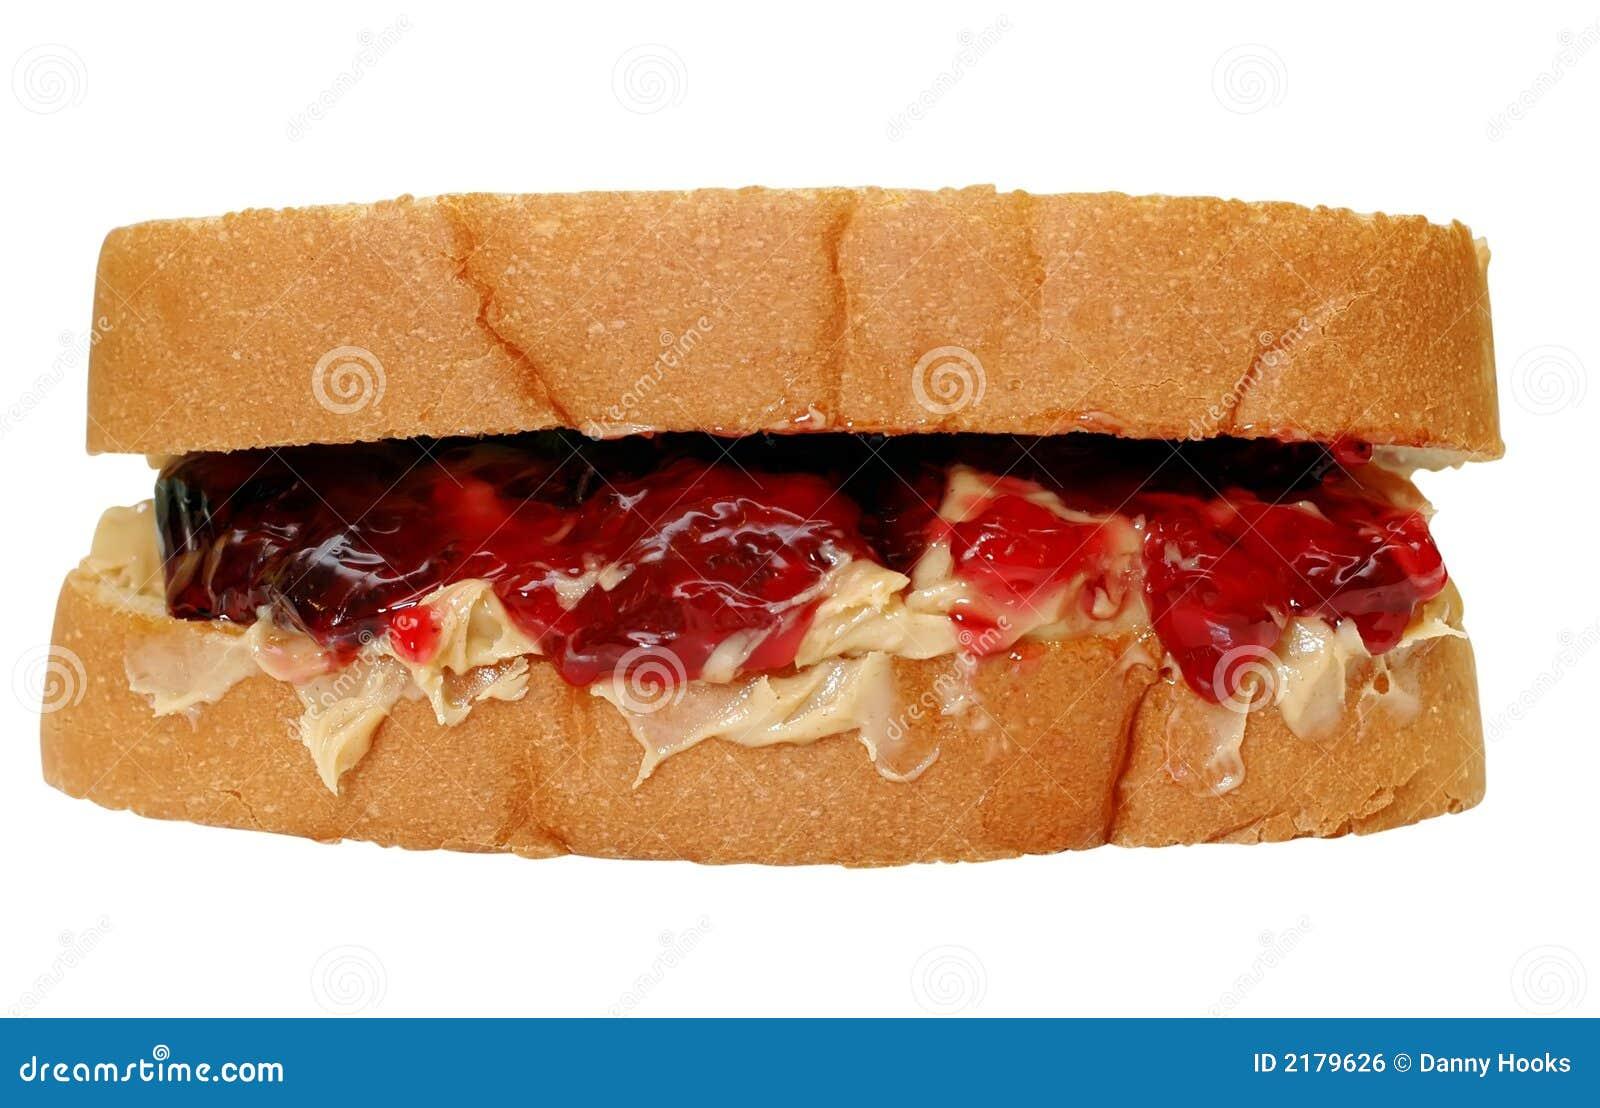 Peanut Butter & Jelly Sandwich Royalty Free Stock Image ...